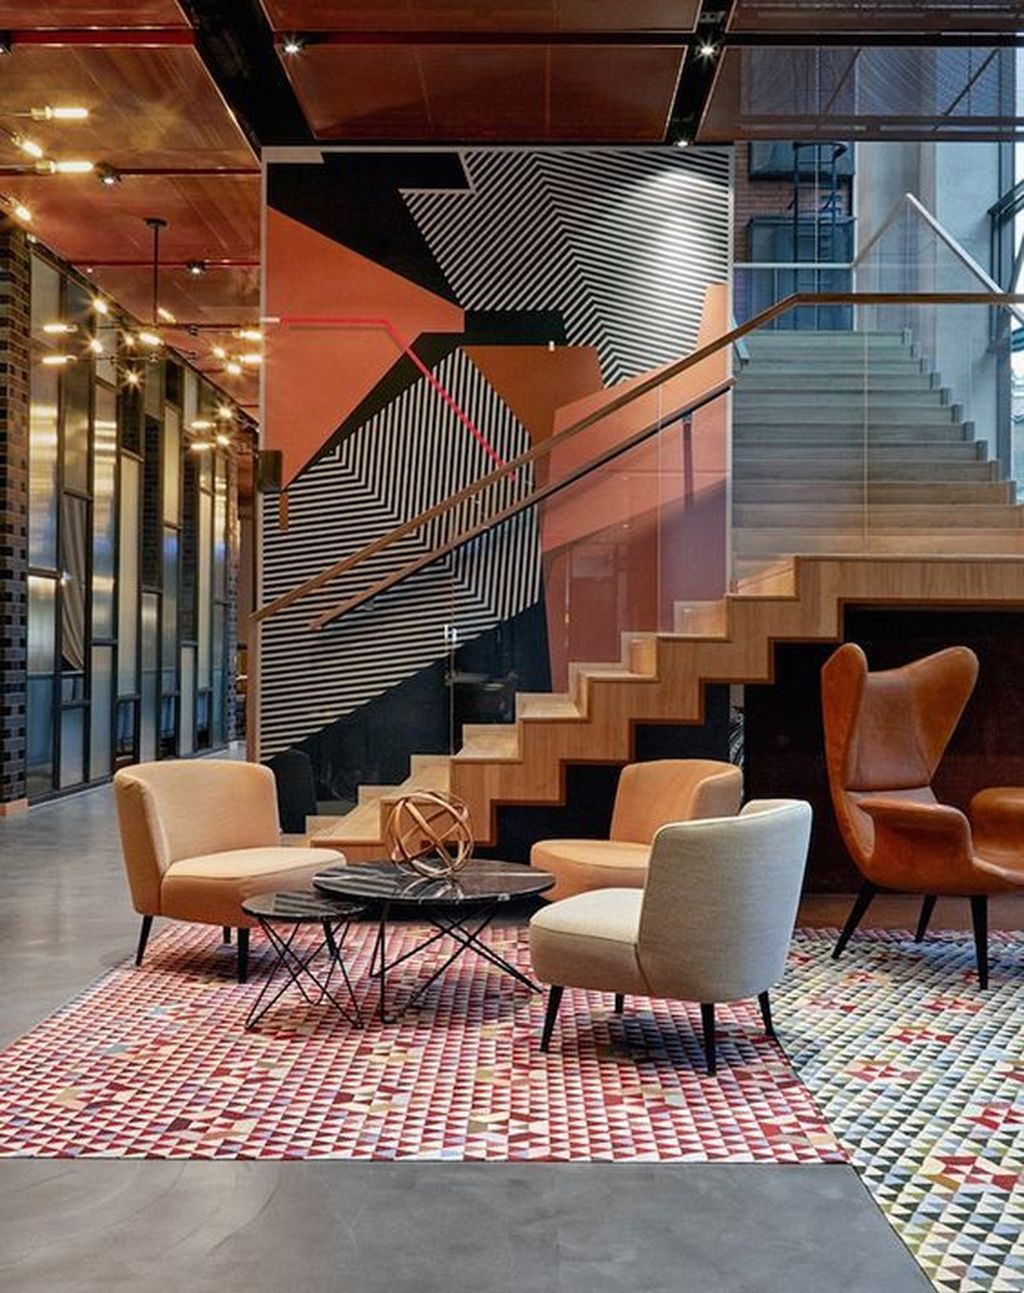 31 Popular Modern Furniture Design Ideas You Should Copy Now